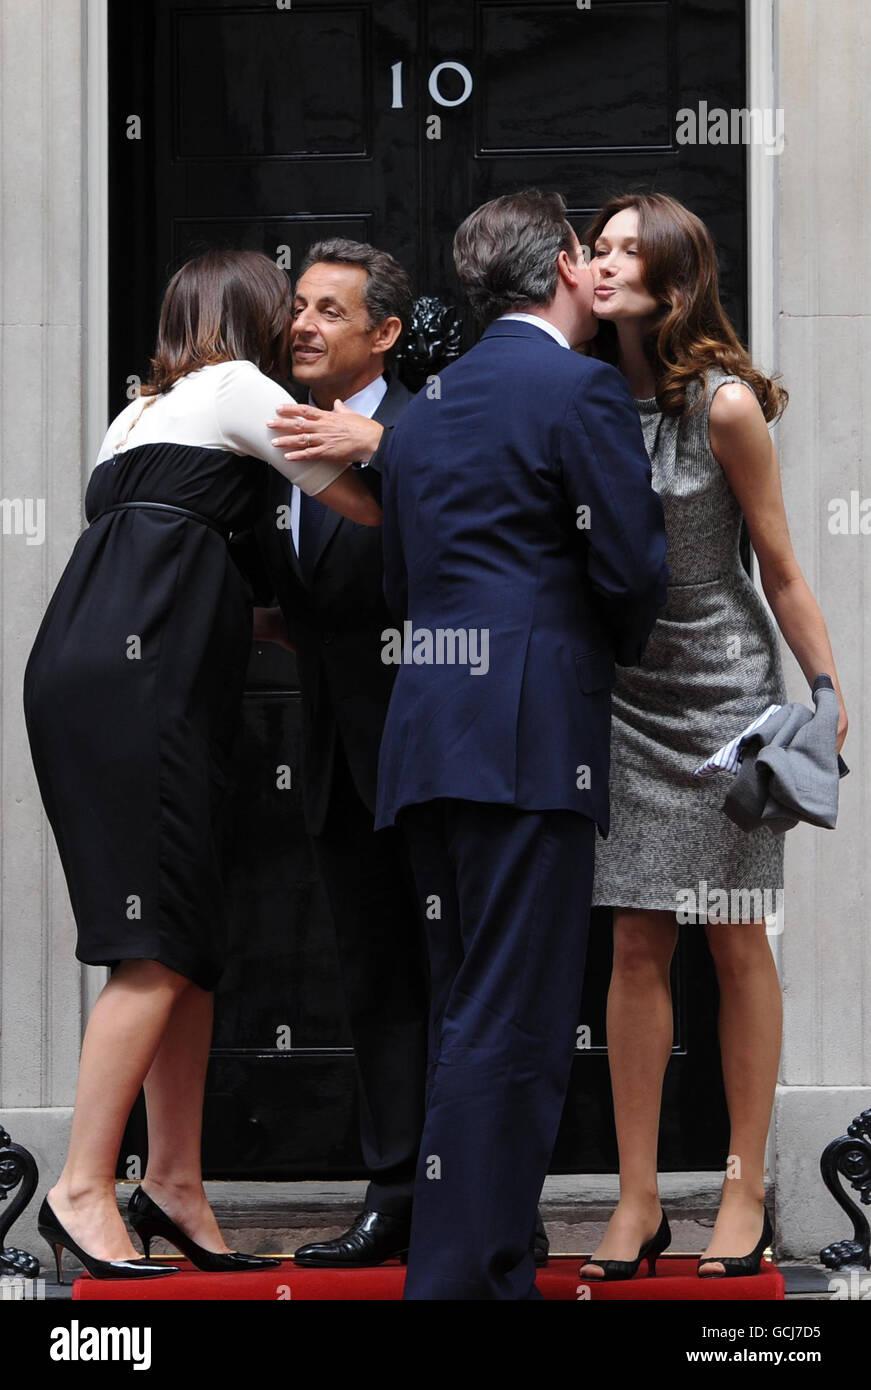 Sarkozy visits London - Stock Image